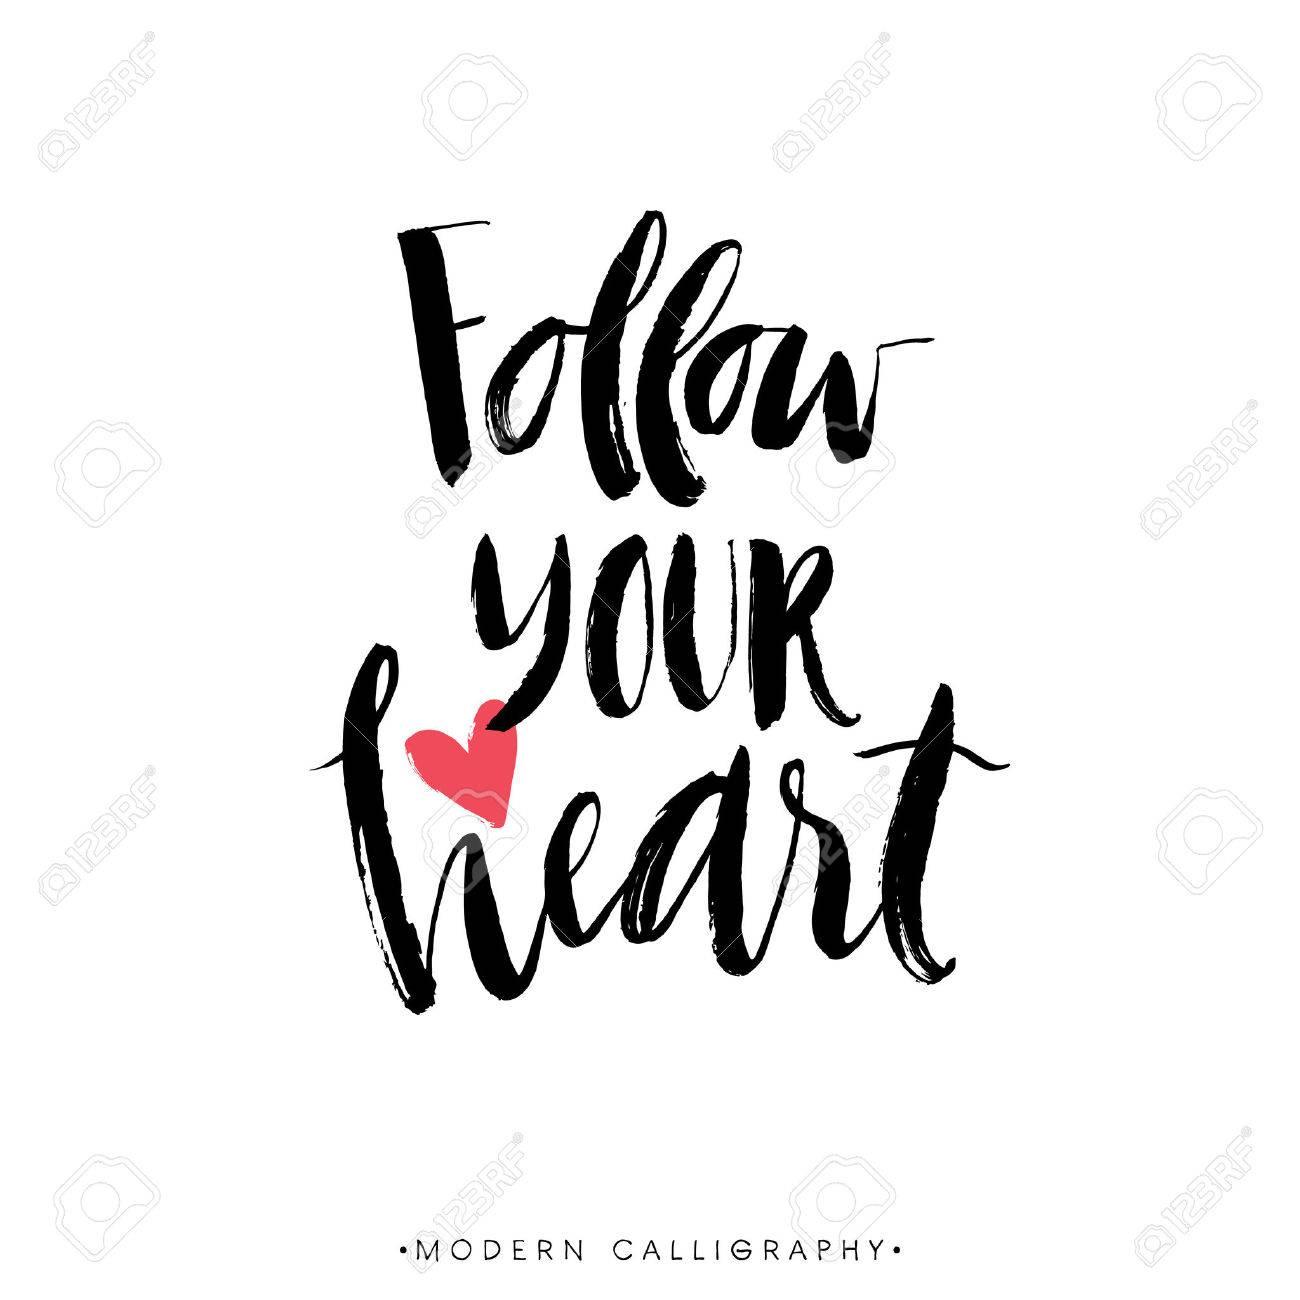 Follow your heart. Modern brush calligraphy. Handwritten ink lettering. Hand drawn design elements. - 45957941